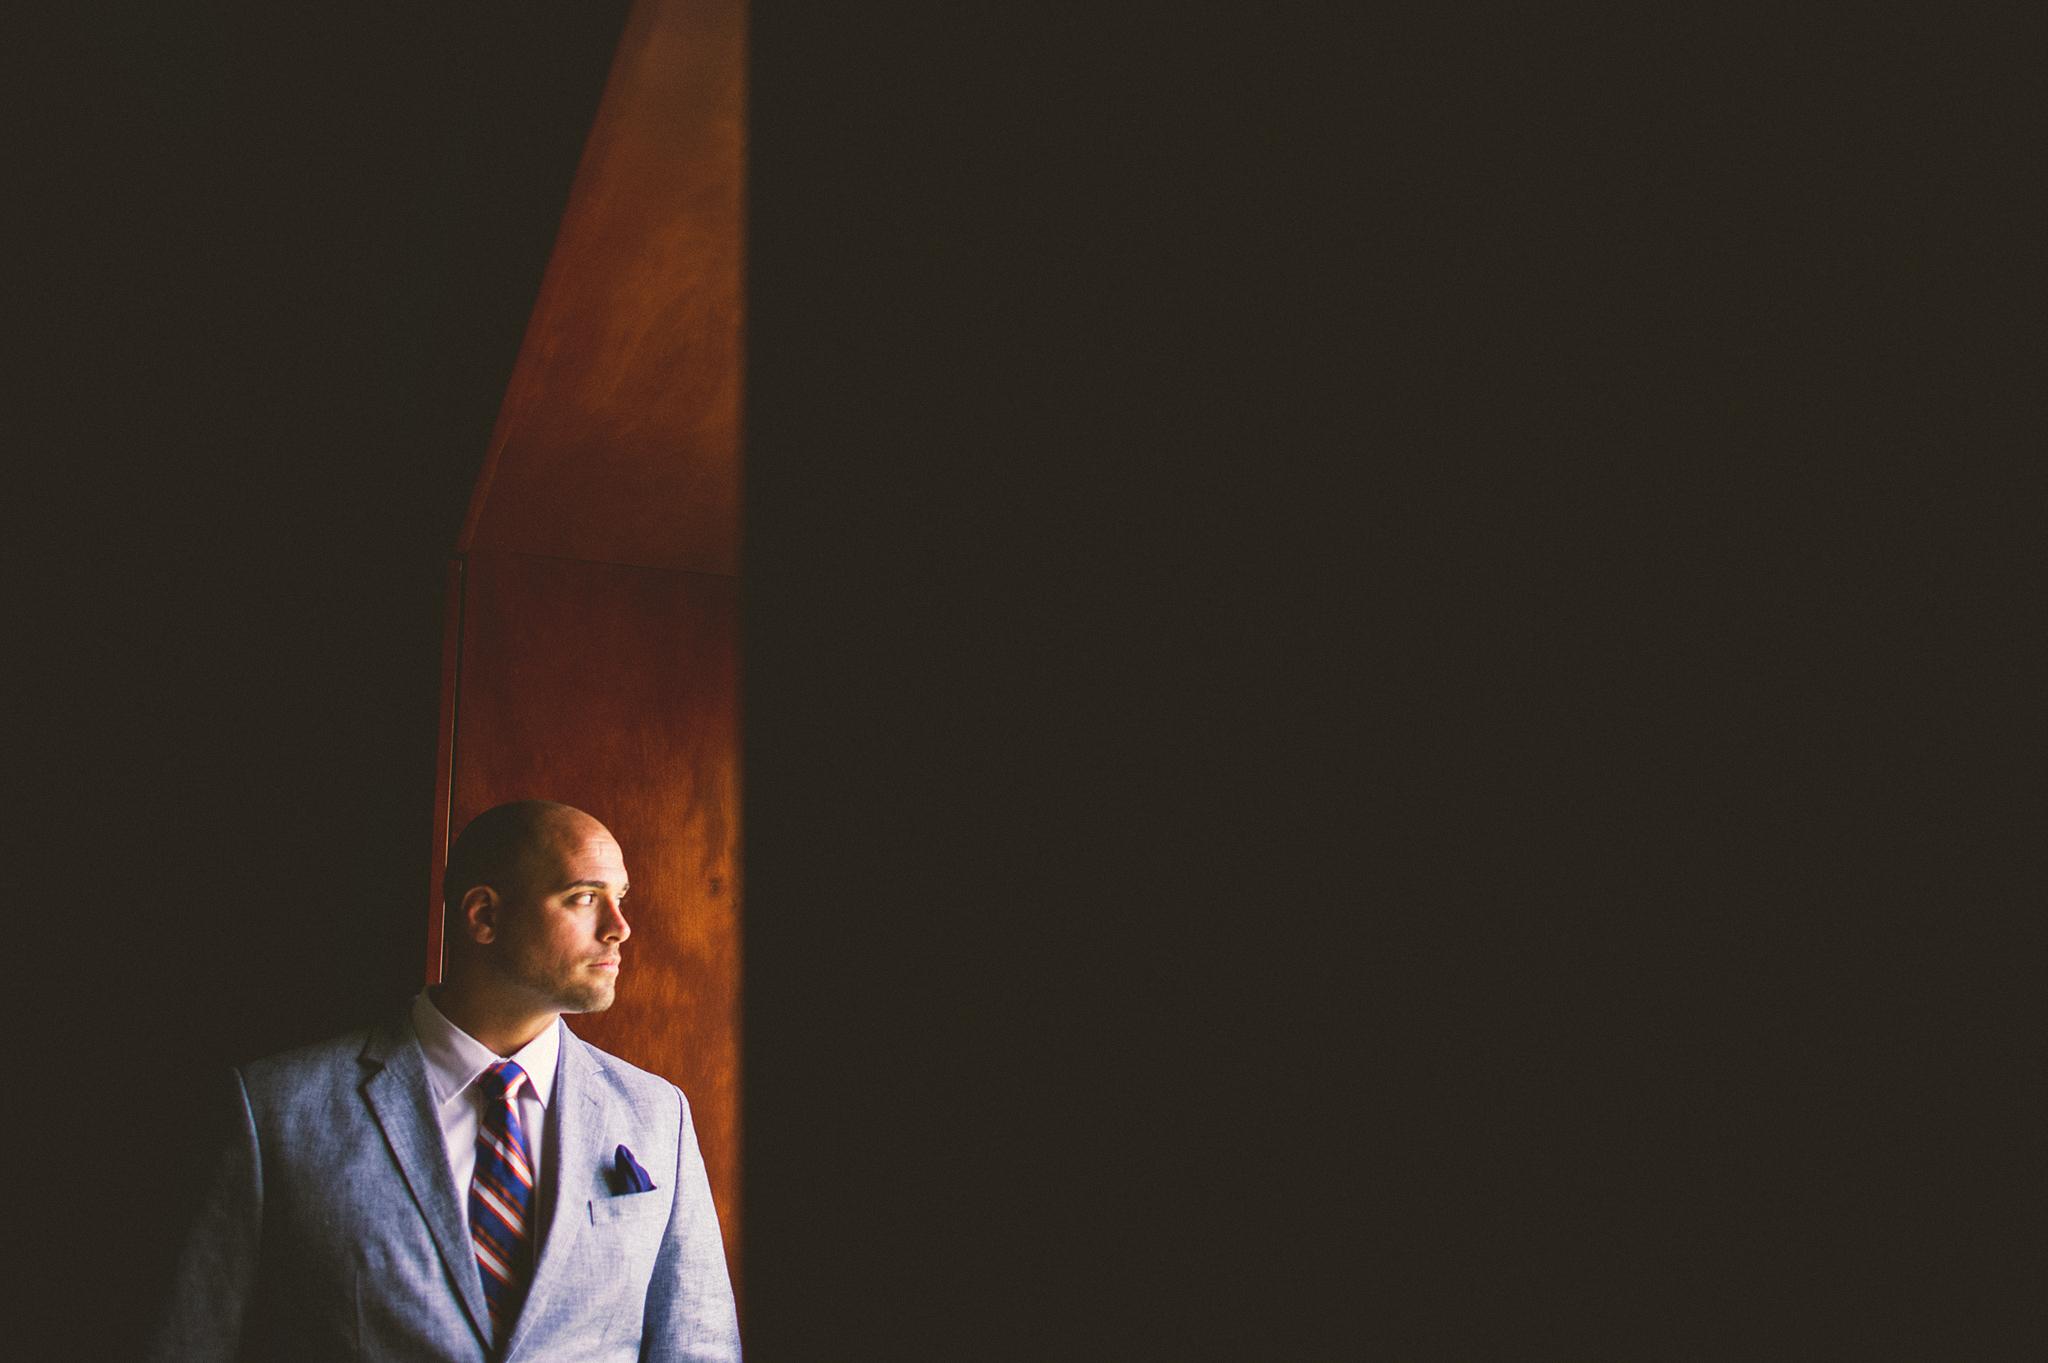 03-groom-portraits.jpg